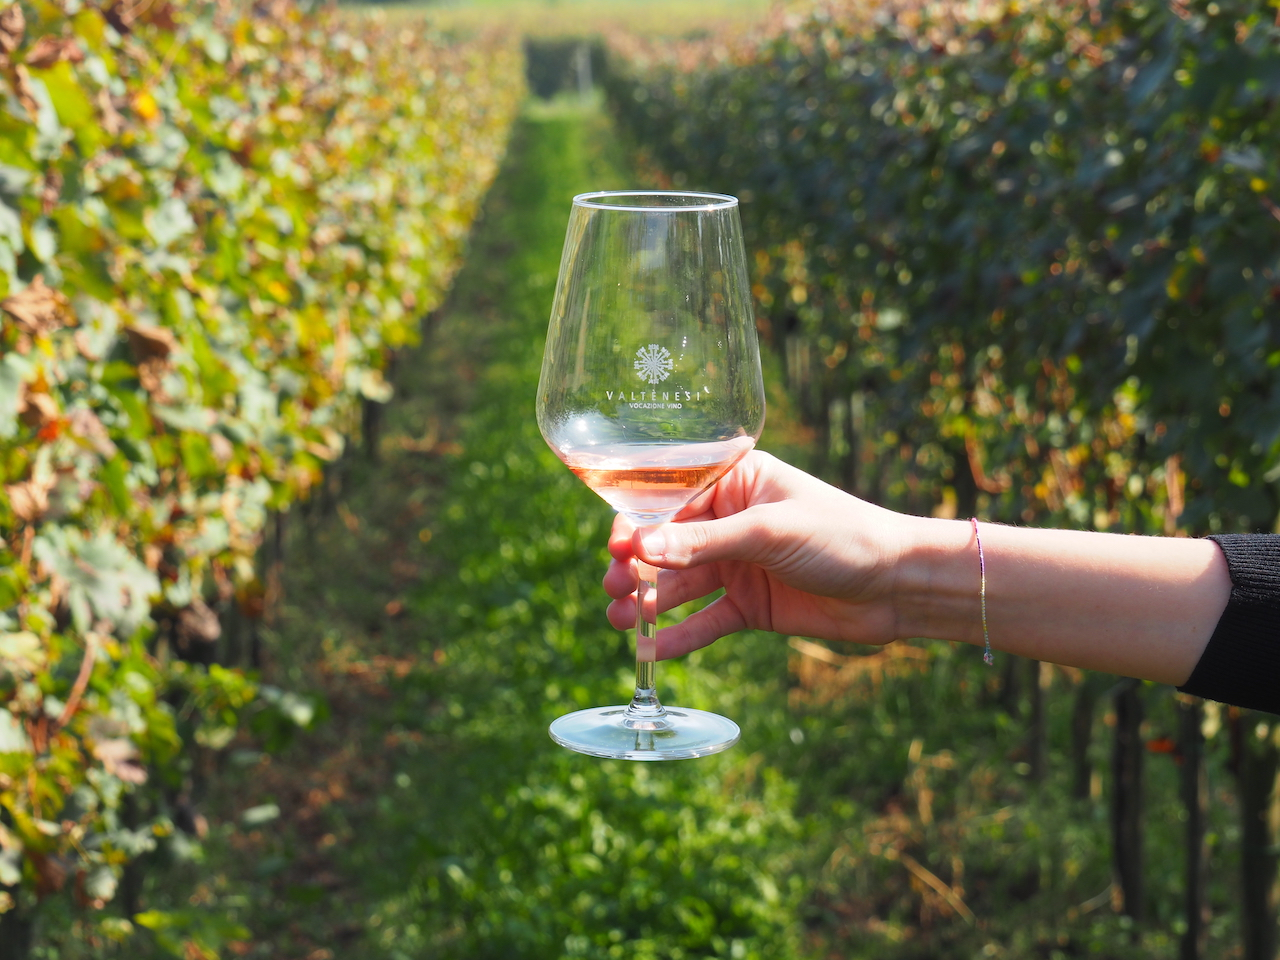 degustazione vini rosa Valtenesi